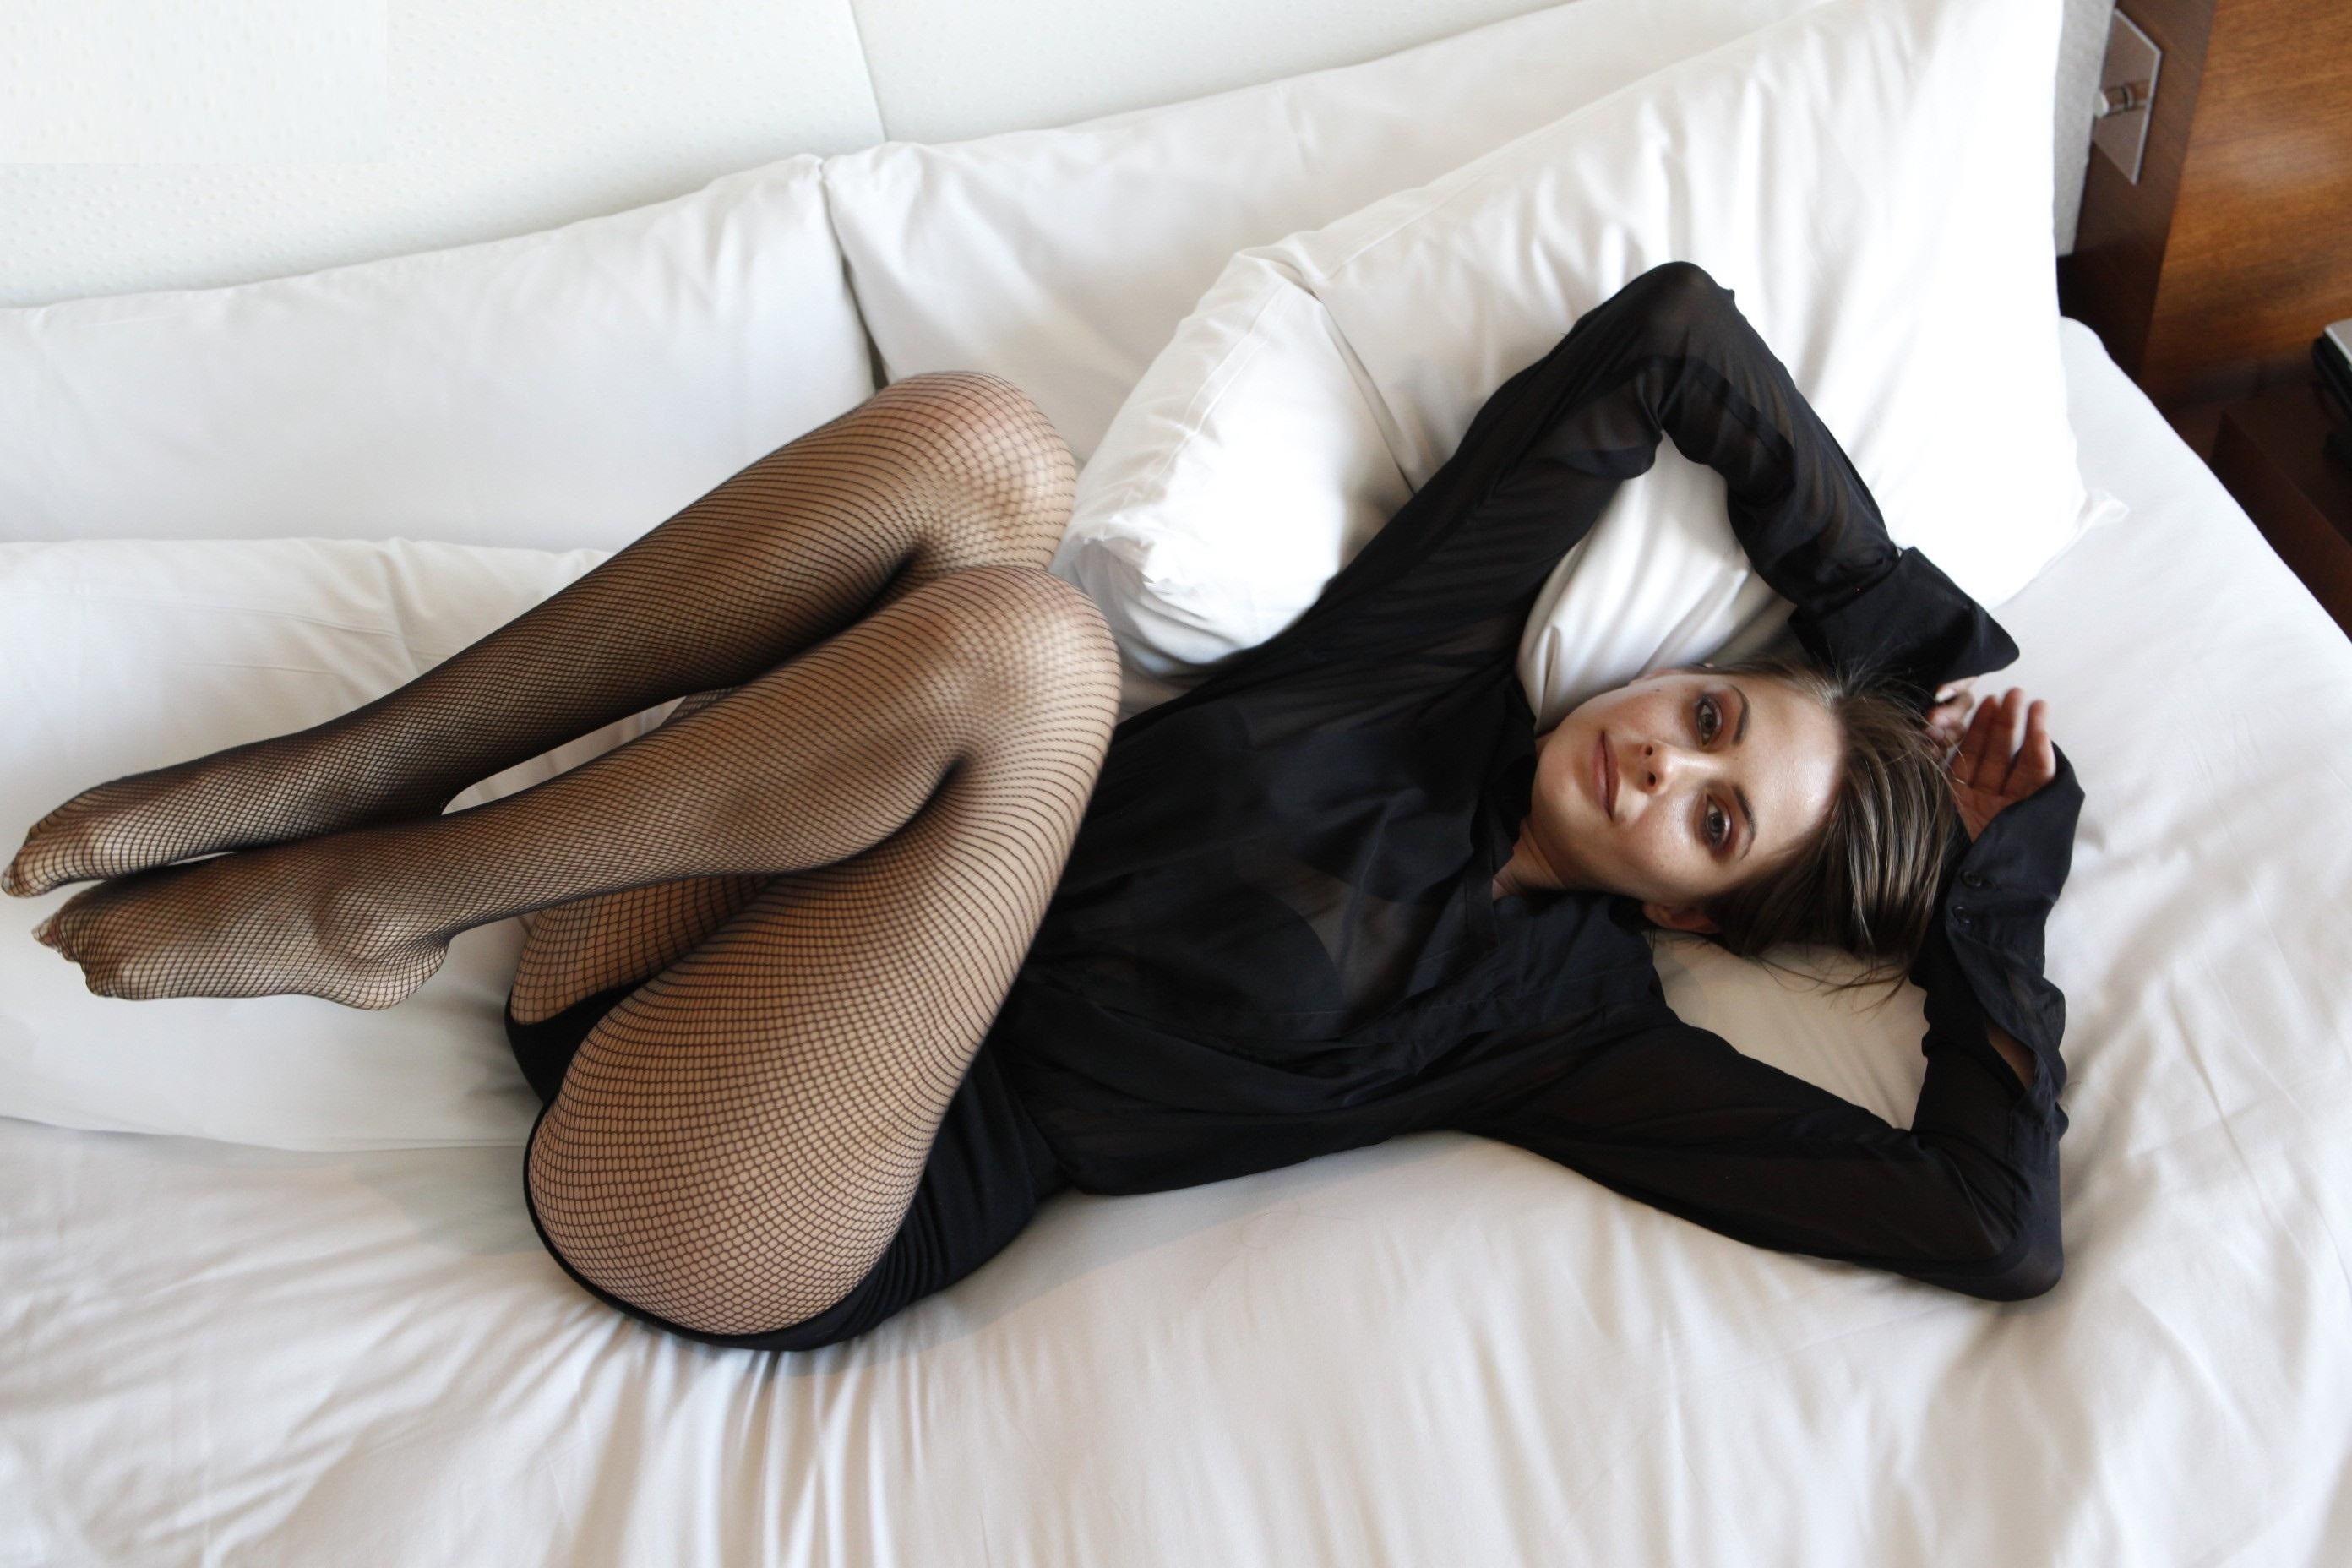 Willa Holland nude pic